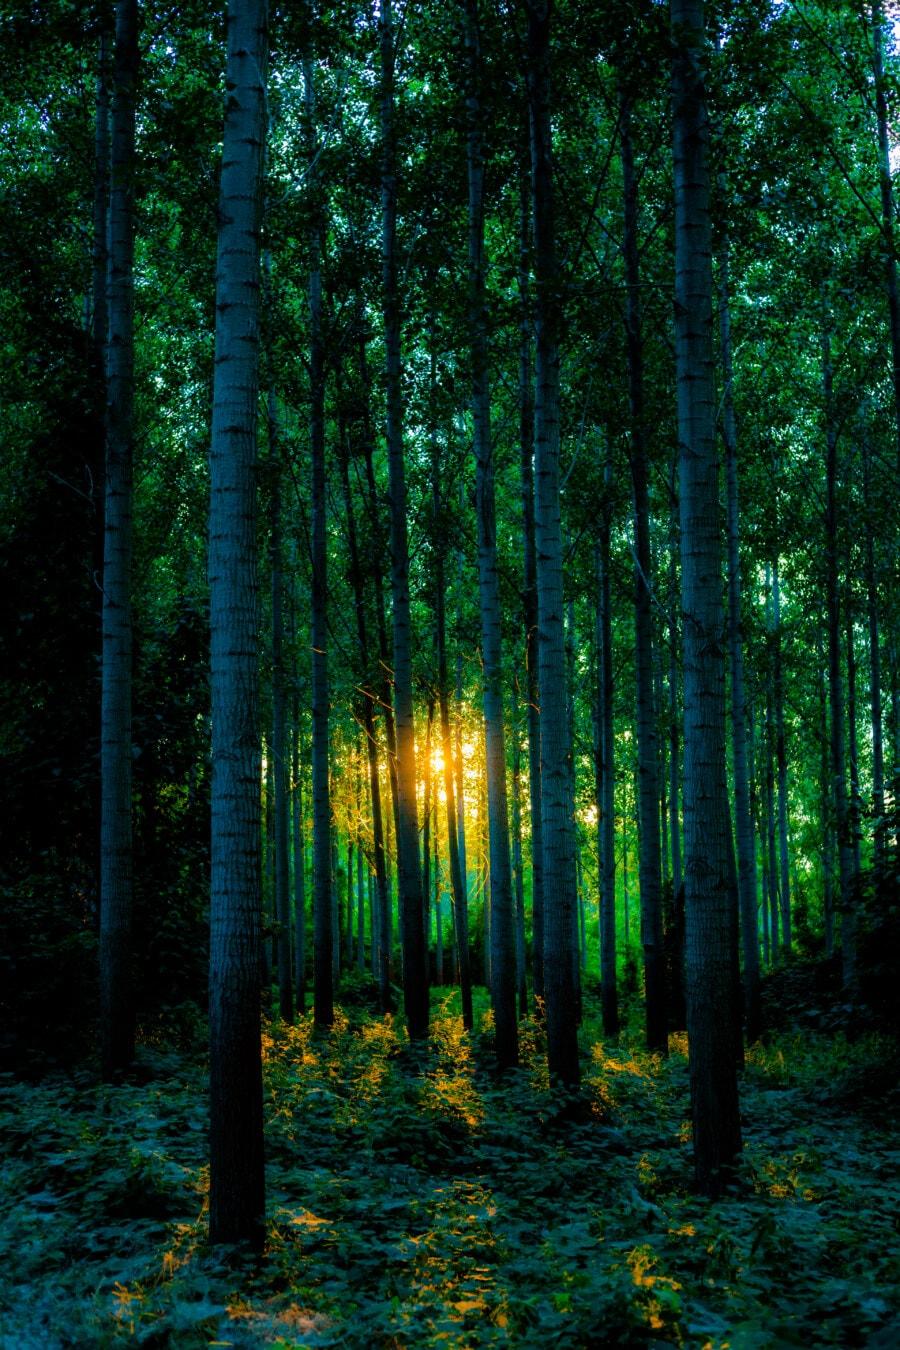 morning glory, forest, poplar, greenery, trees, sunrise, sunrays, tree, wood, landscape